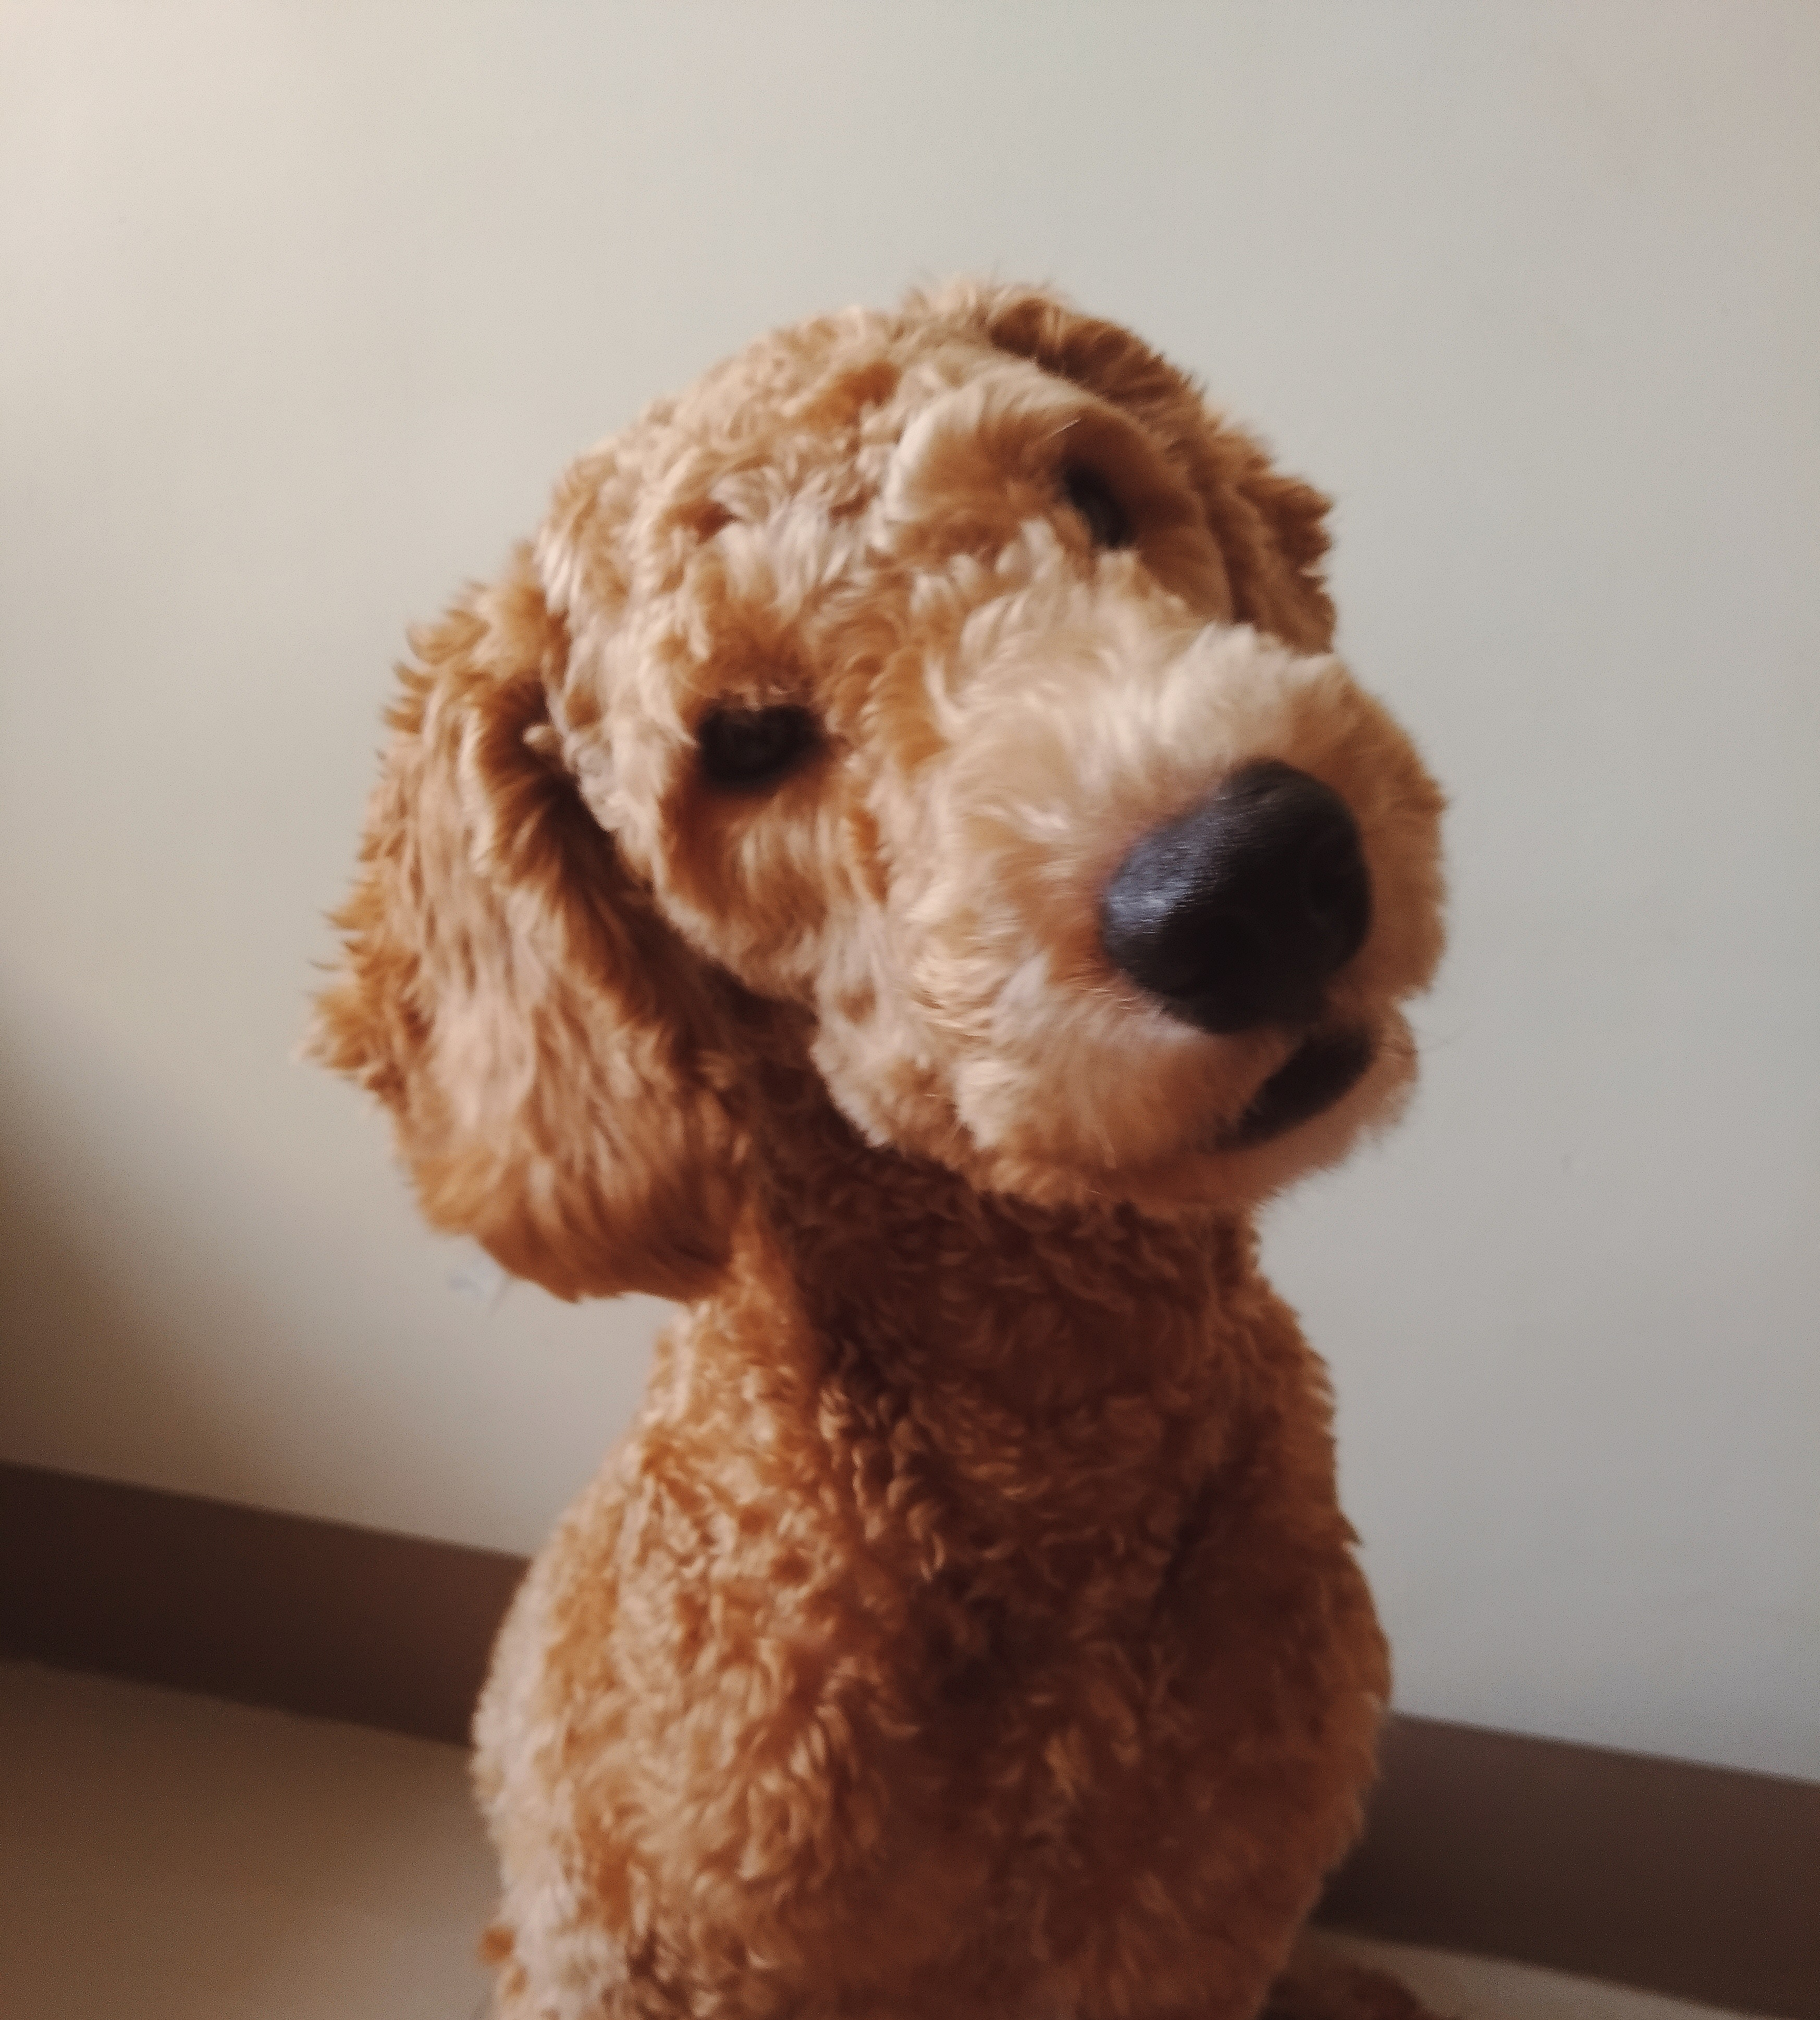 cute-dog-listening-poodle-thinking-2524377